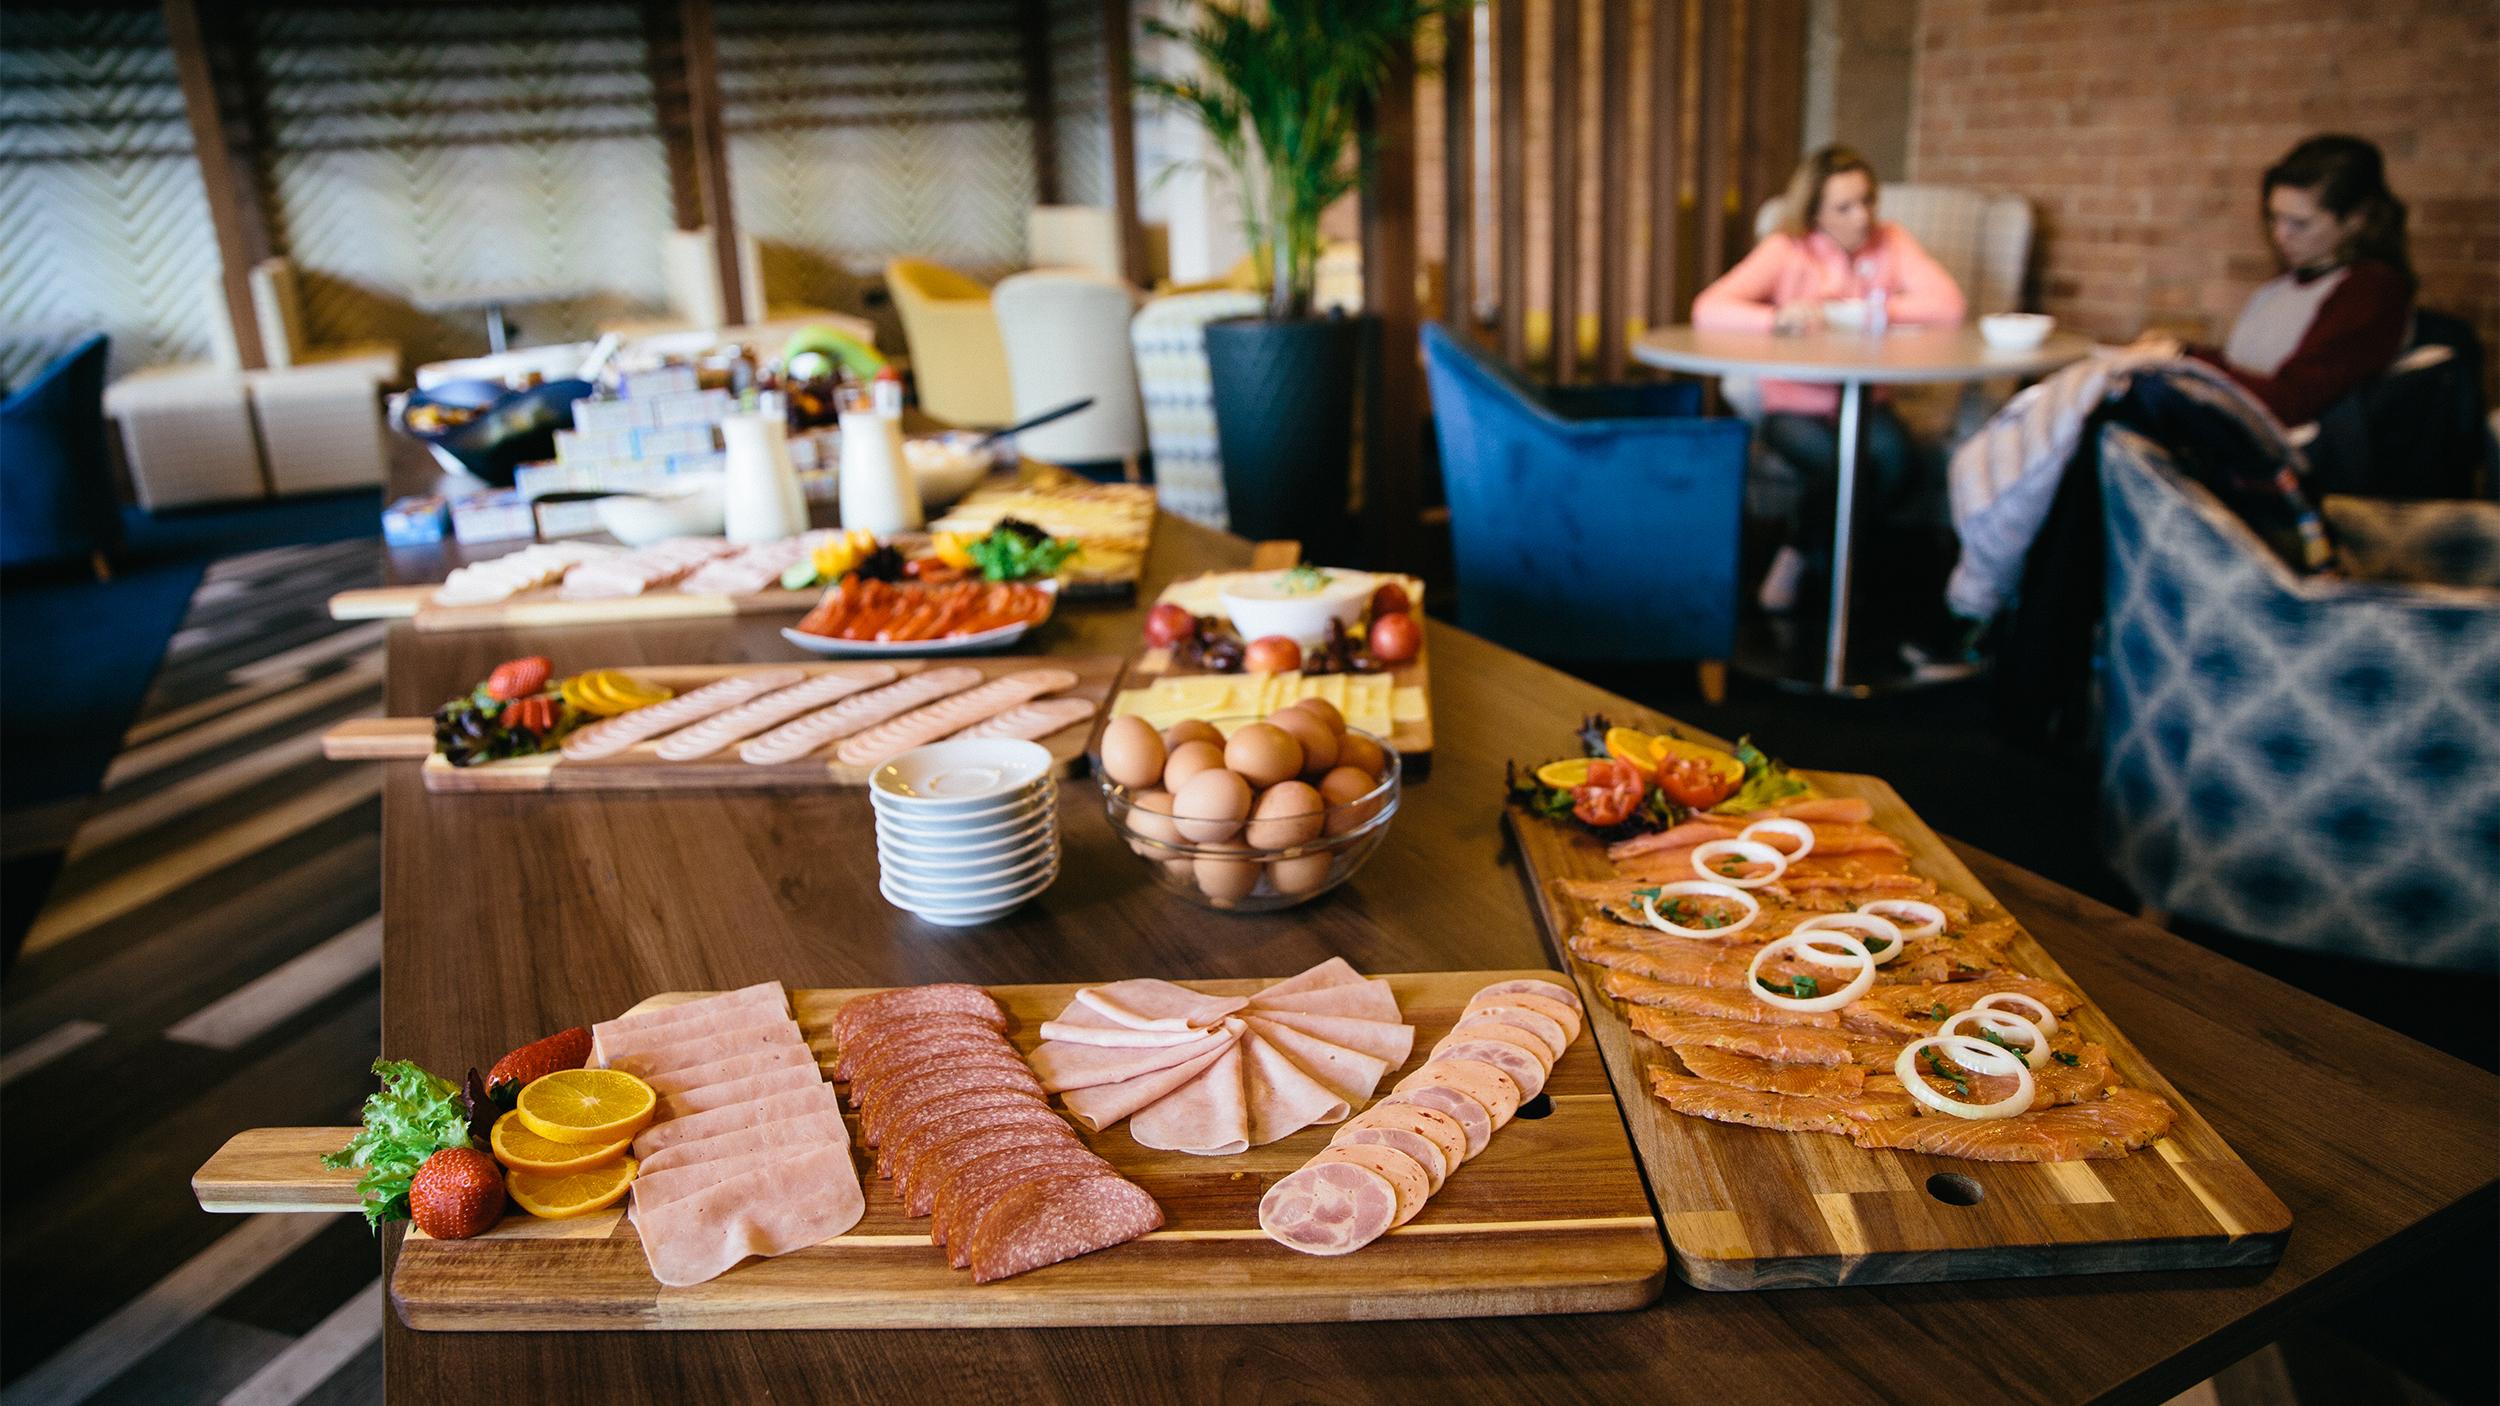 hub26 meet - club26 drinks & dining